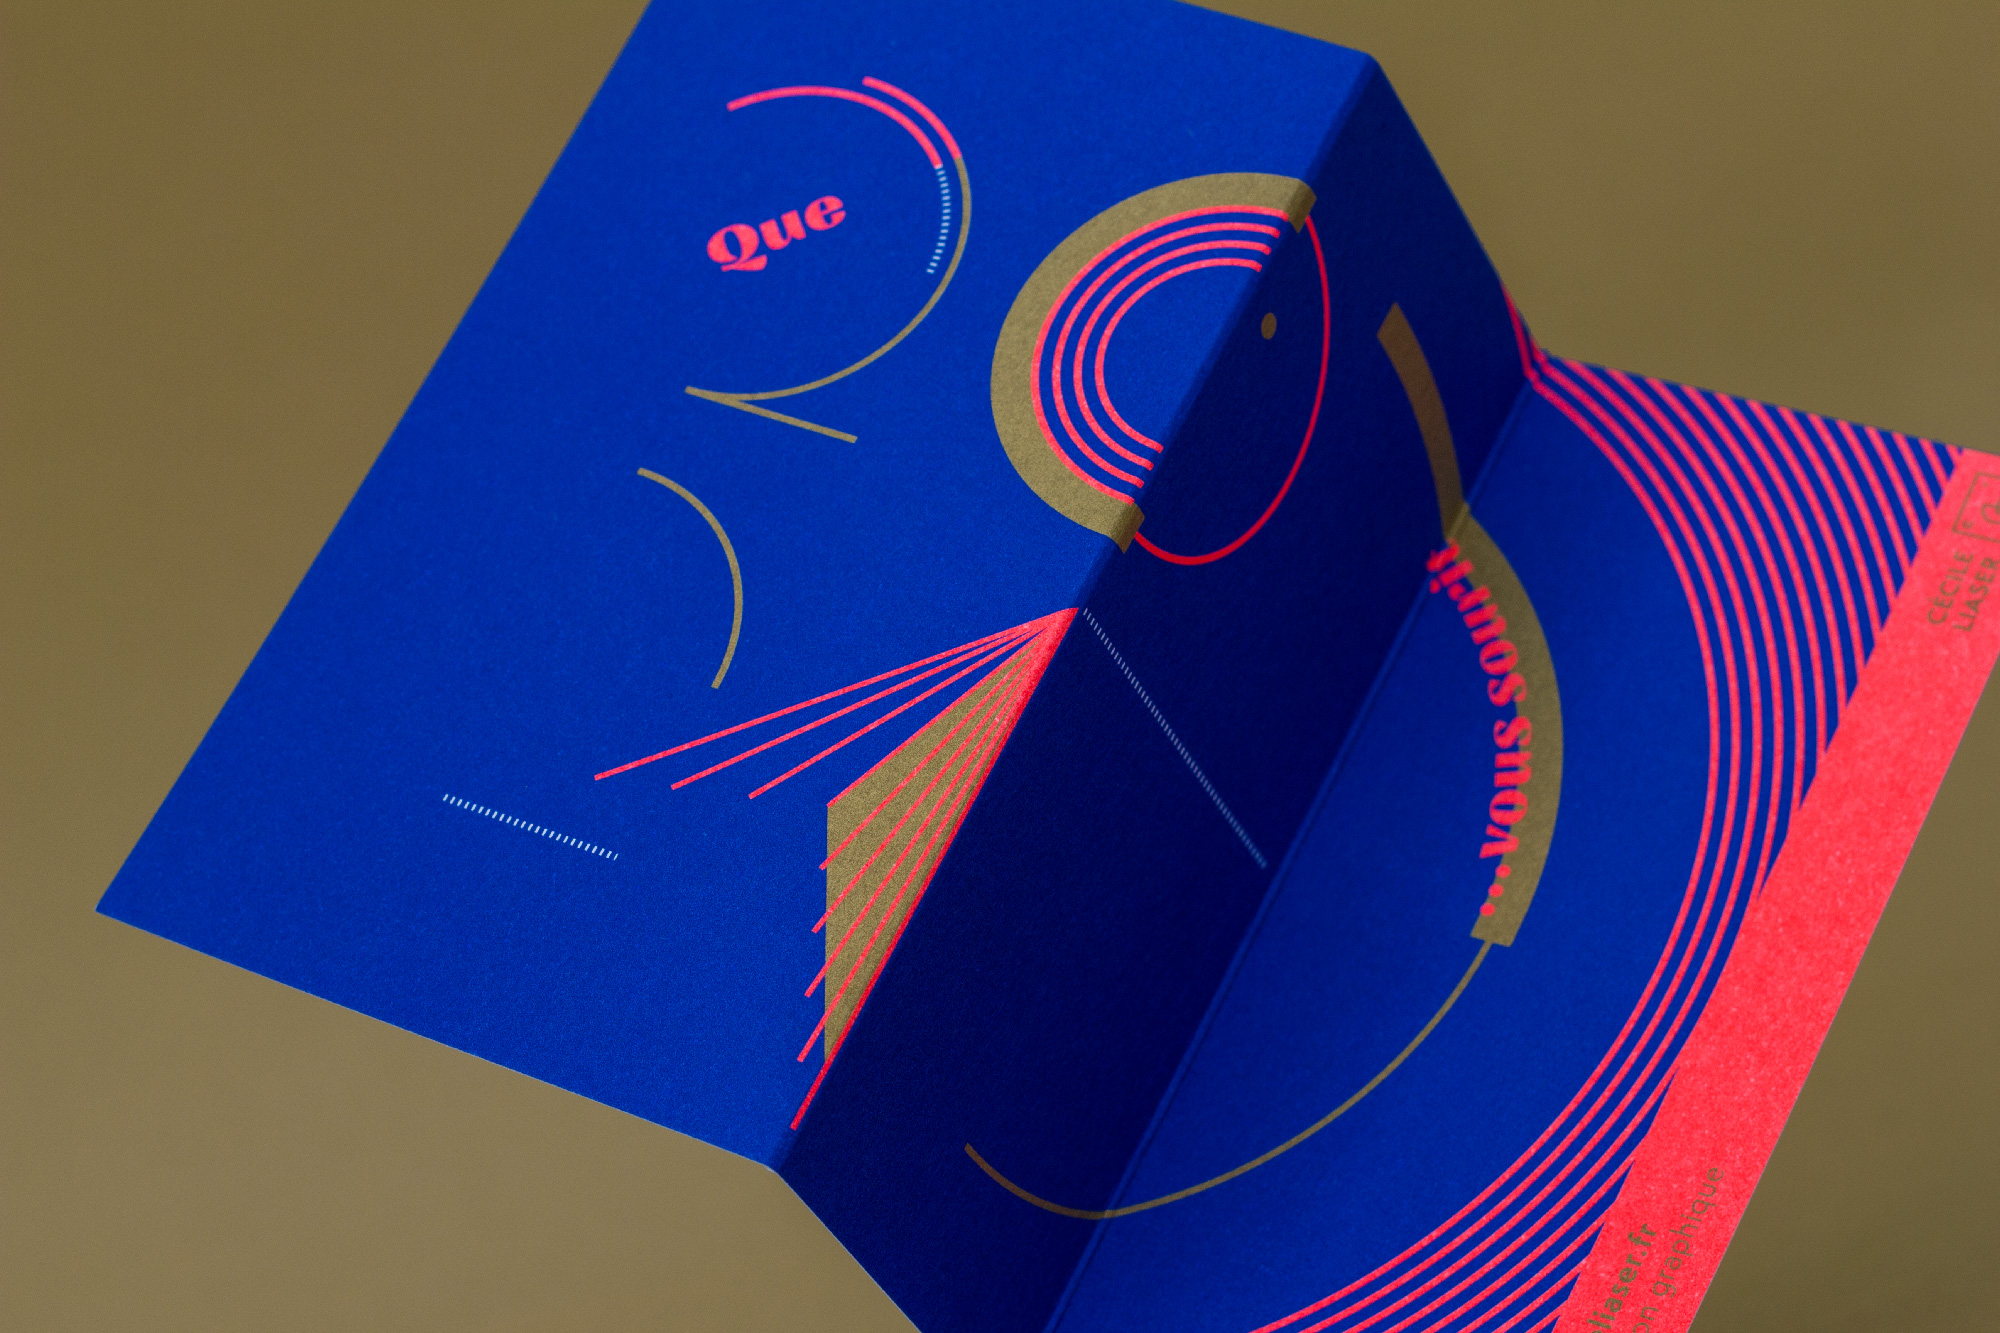 Carte de vœux - 2 plis accordéons